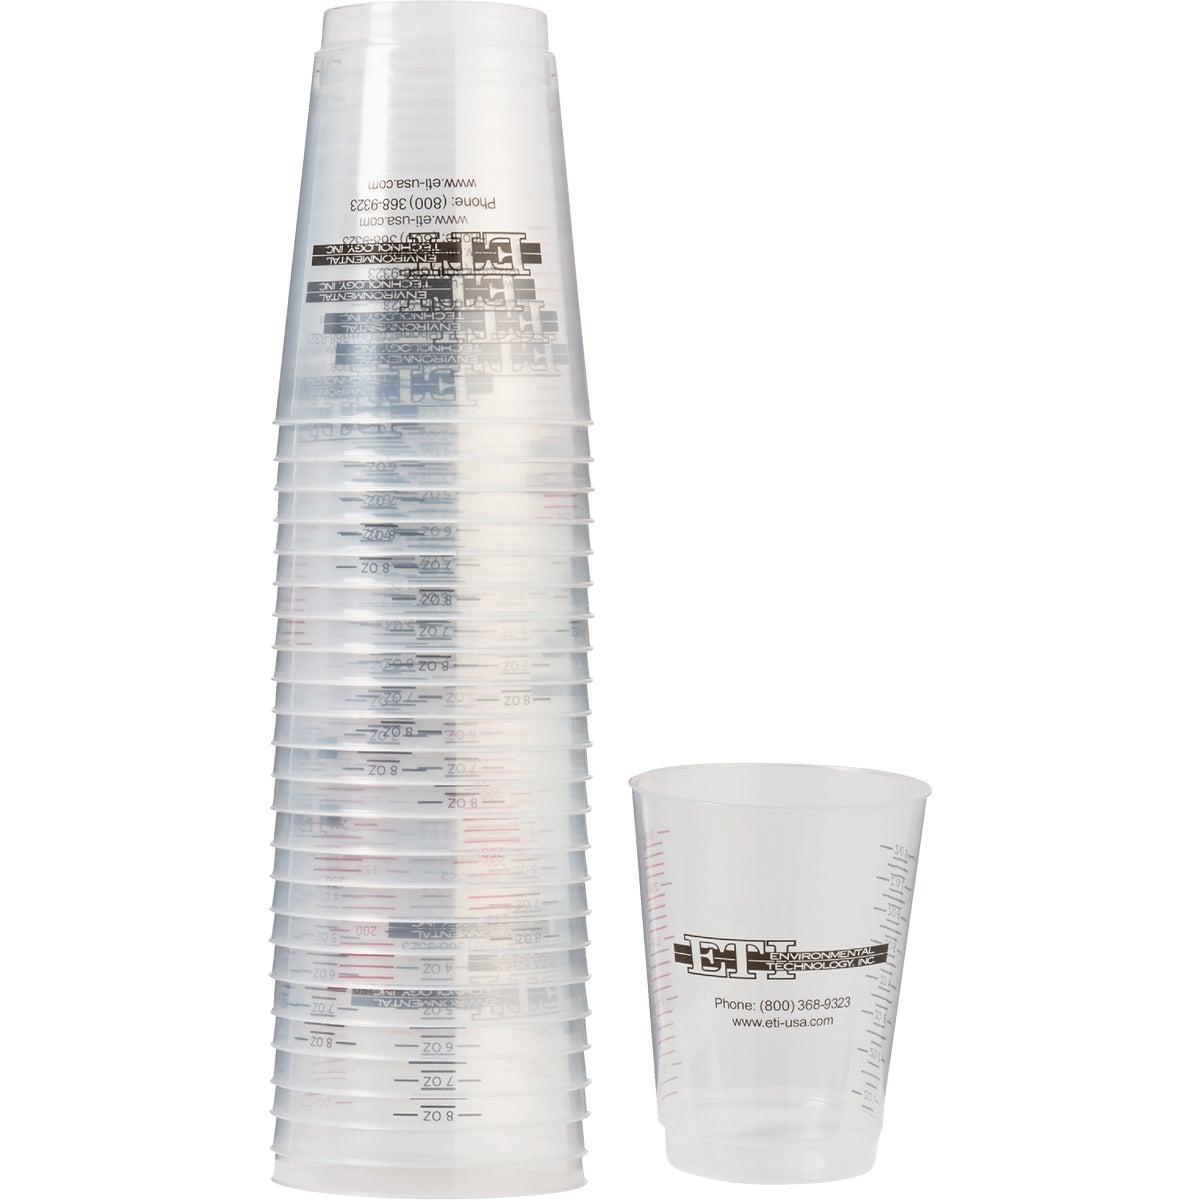 Environmental Tech. 10OZ GRADUATED MIX CUP 1031